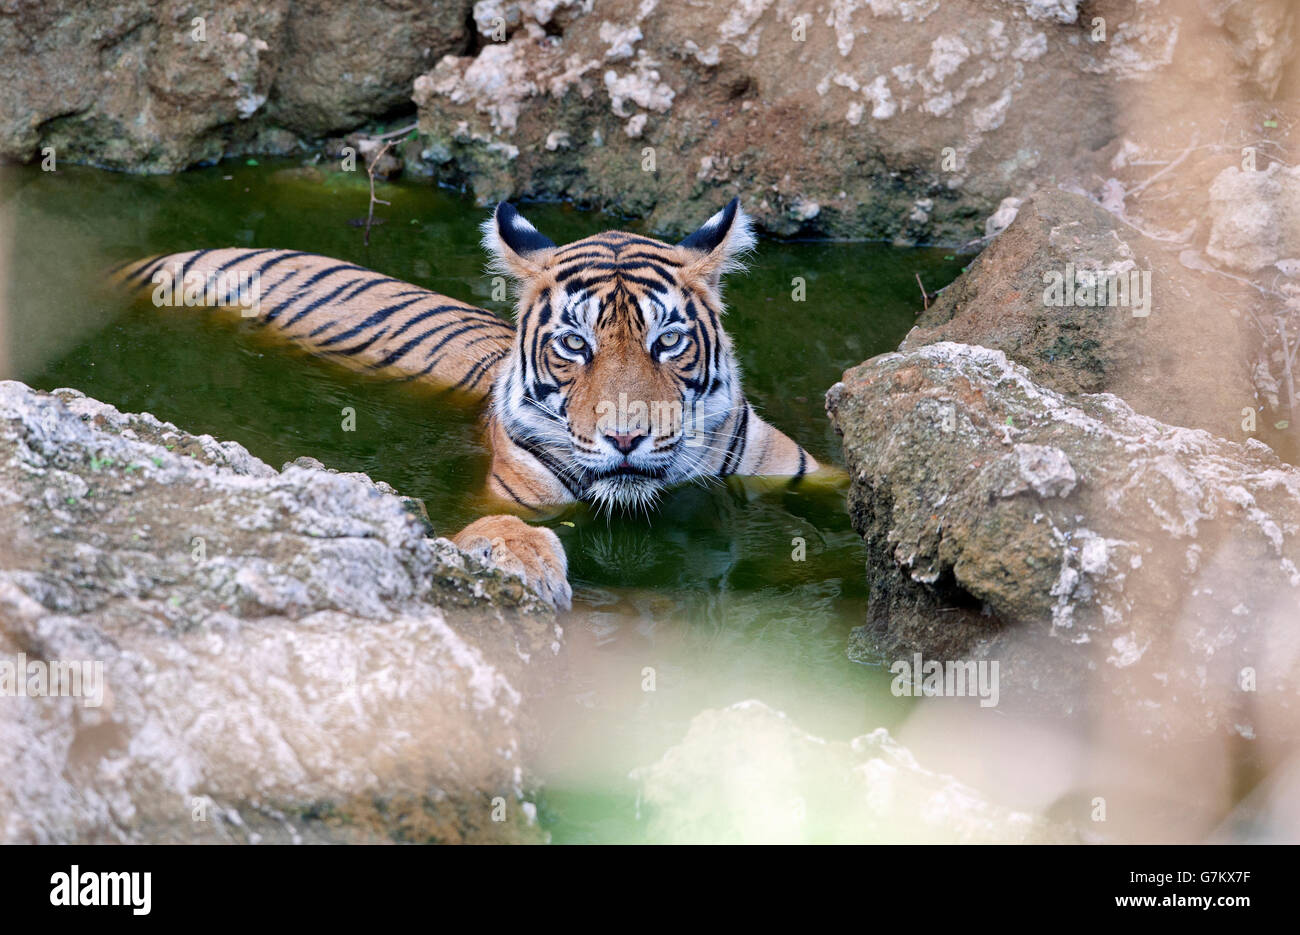 The image of Tiger ( Panthera tigris ) T60 was taken in Ranthambore, India Stock Photo